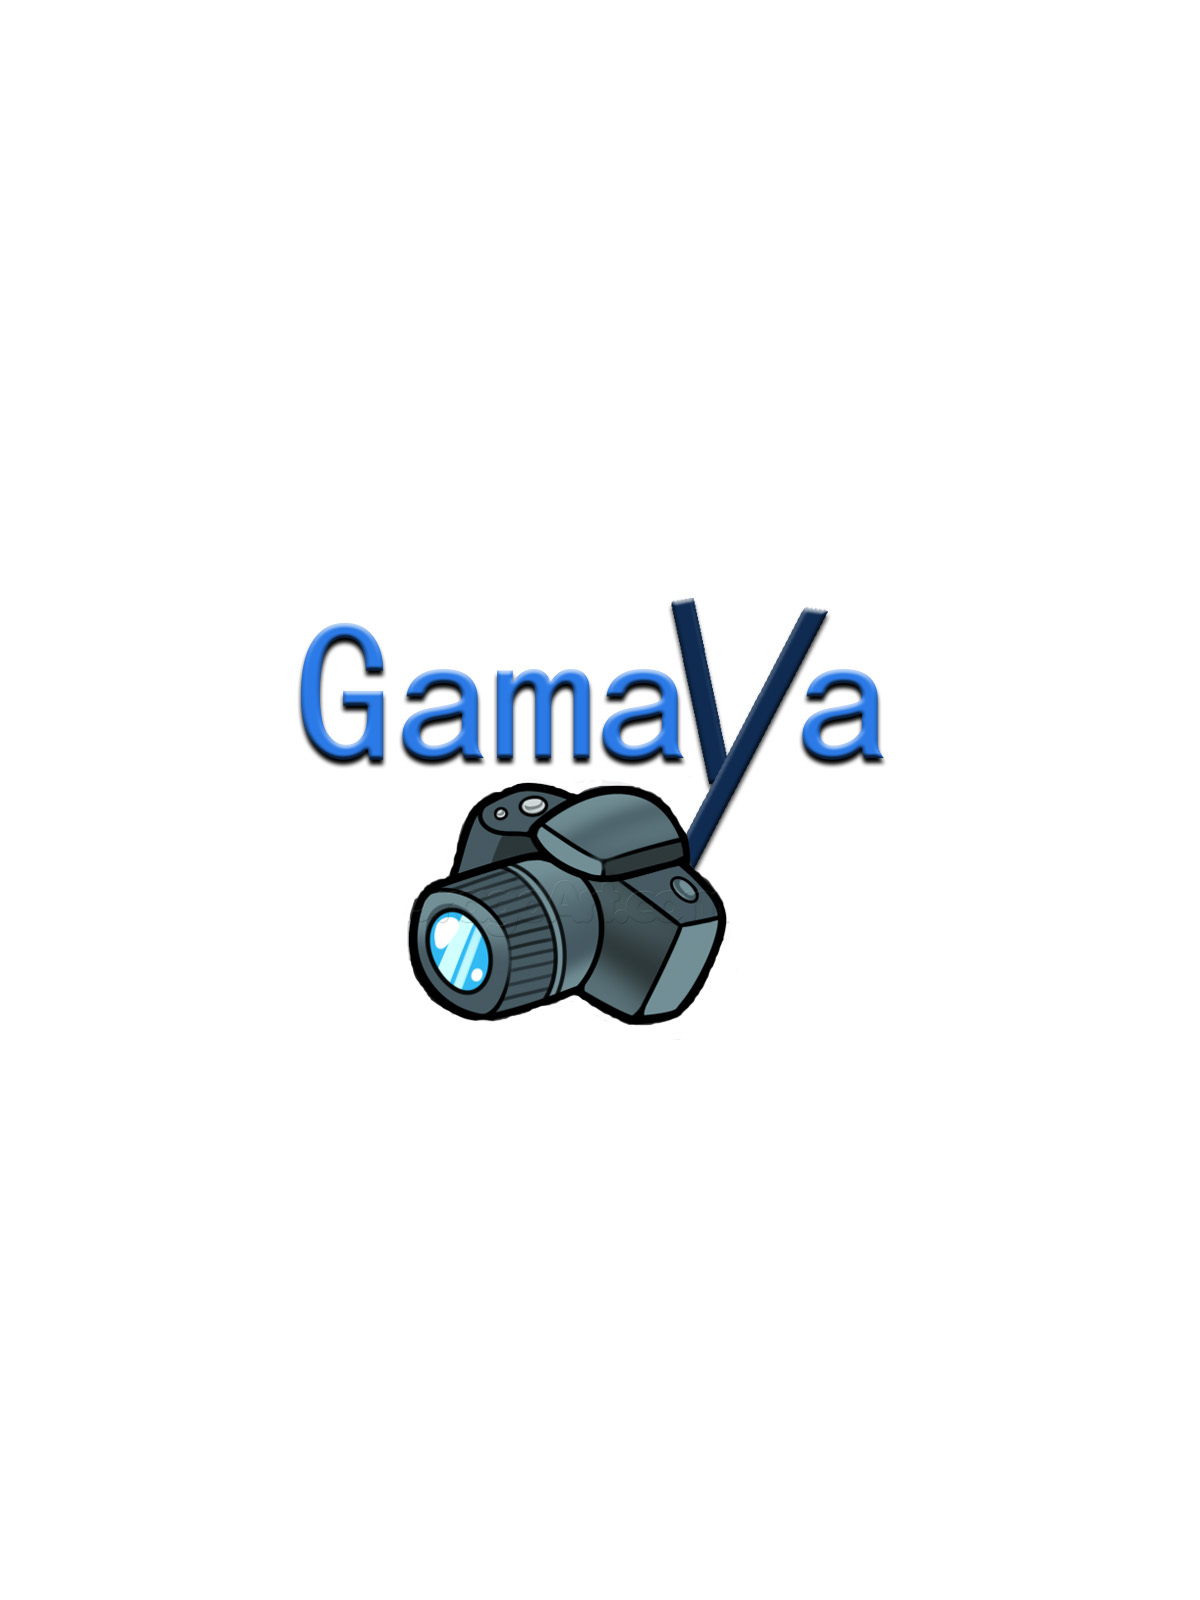 Разработка логотипа для компании Gamaya фото f_536548450aaf2b24.jpg